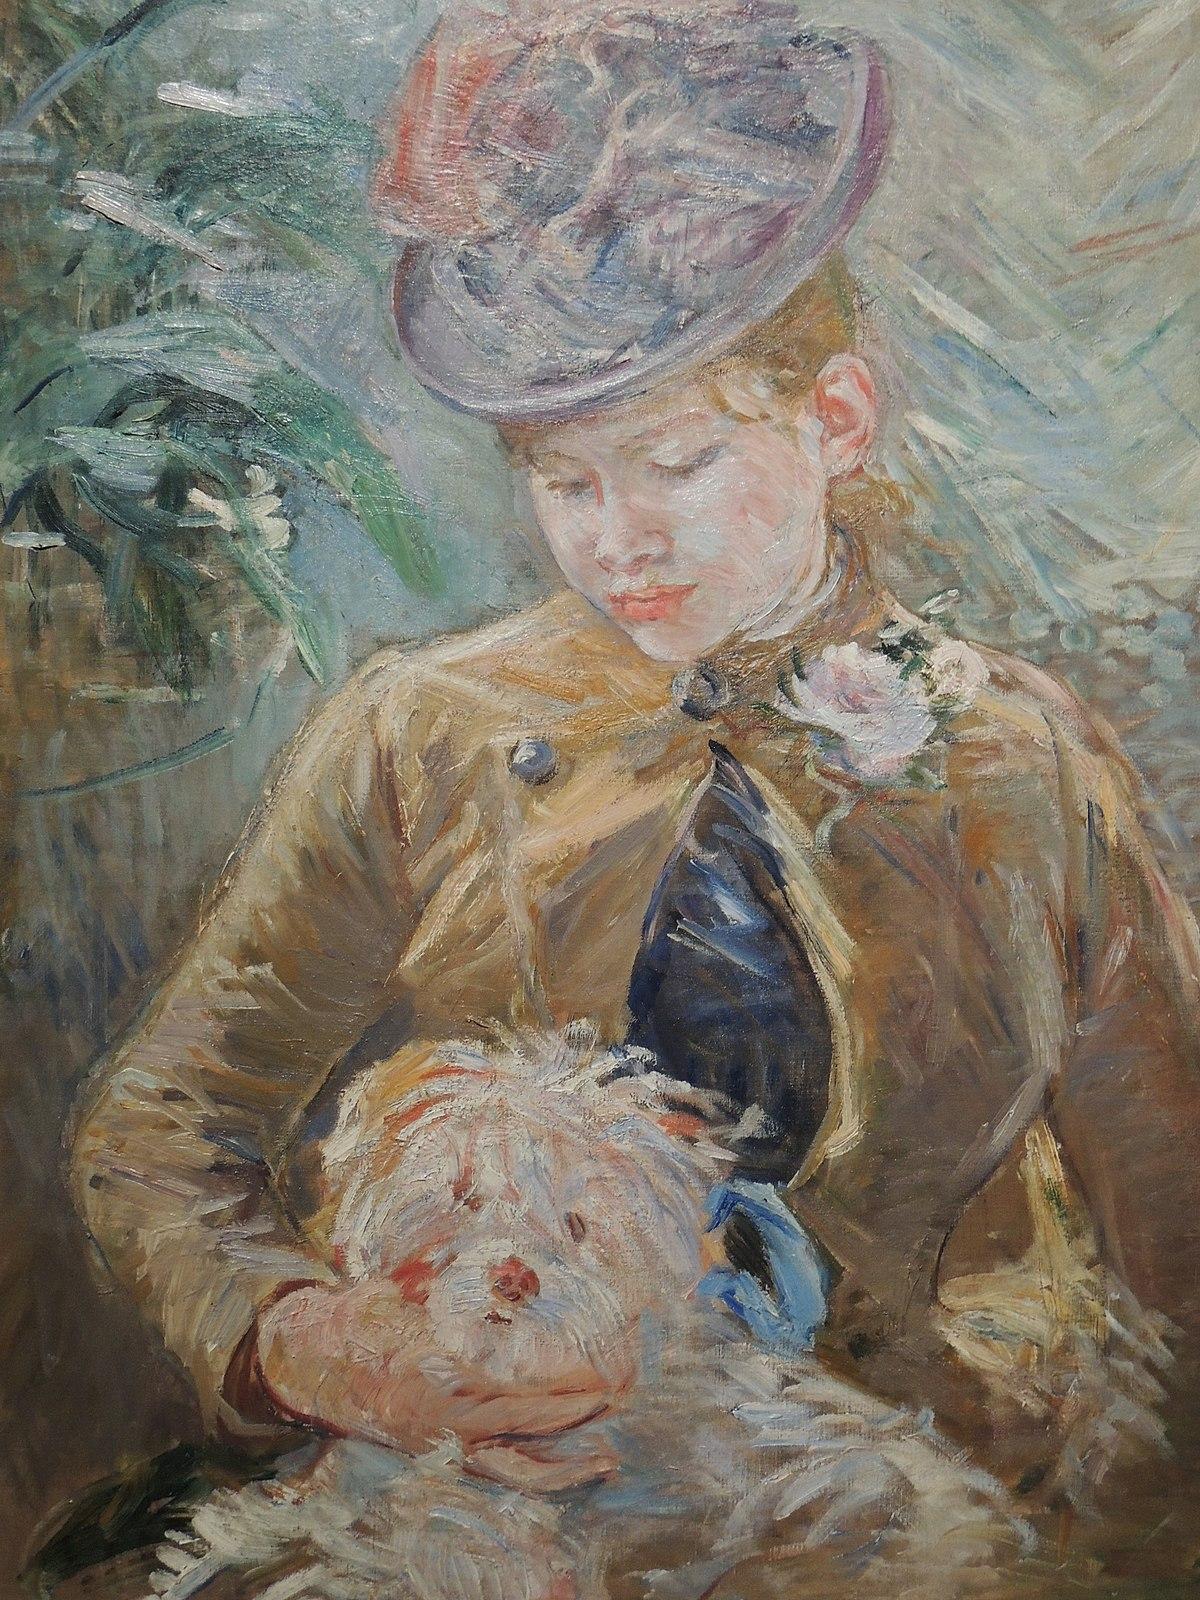 File:Jeune Fille au chien (Morisot).jpg - Wikimedia Commons